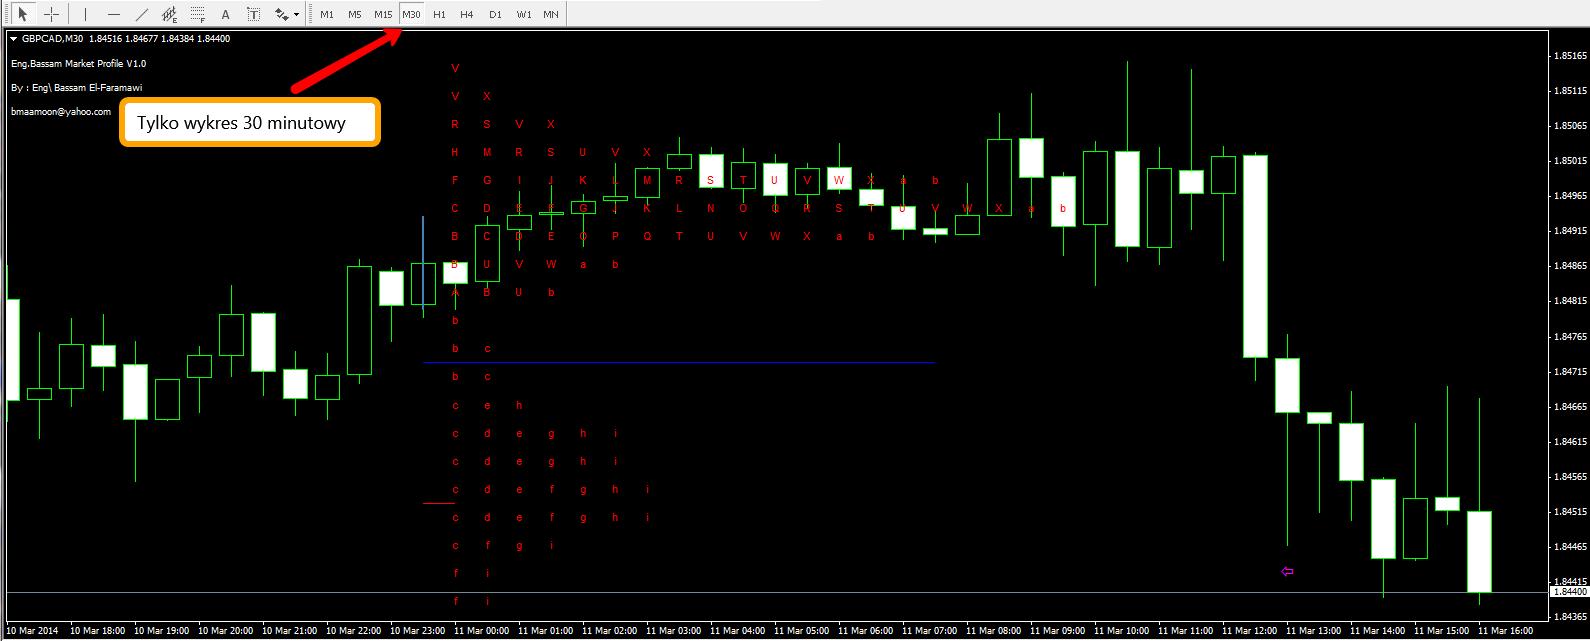 Market Profile 5